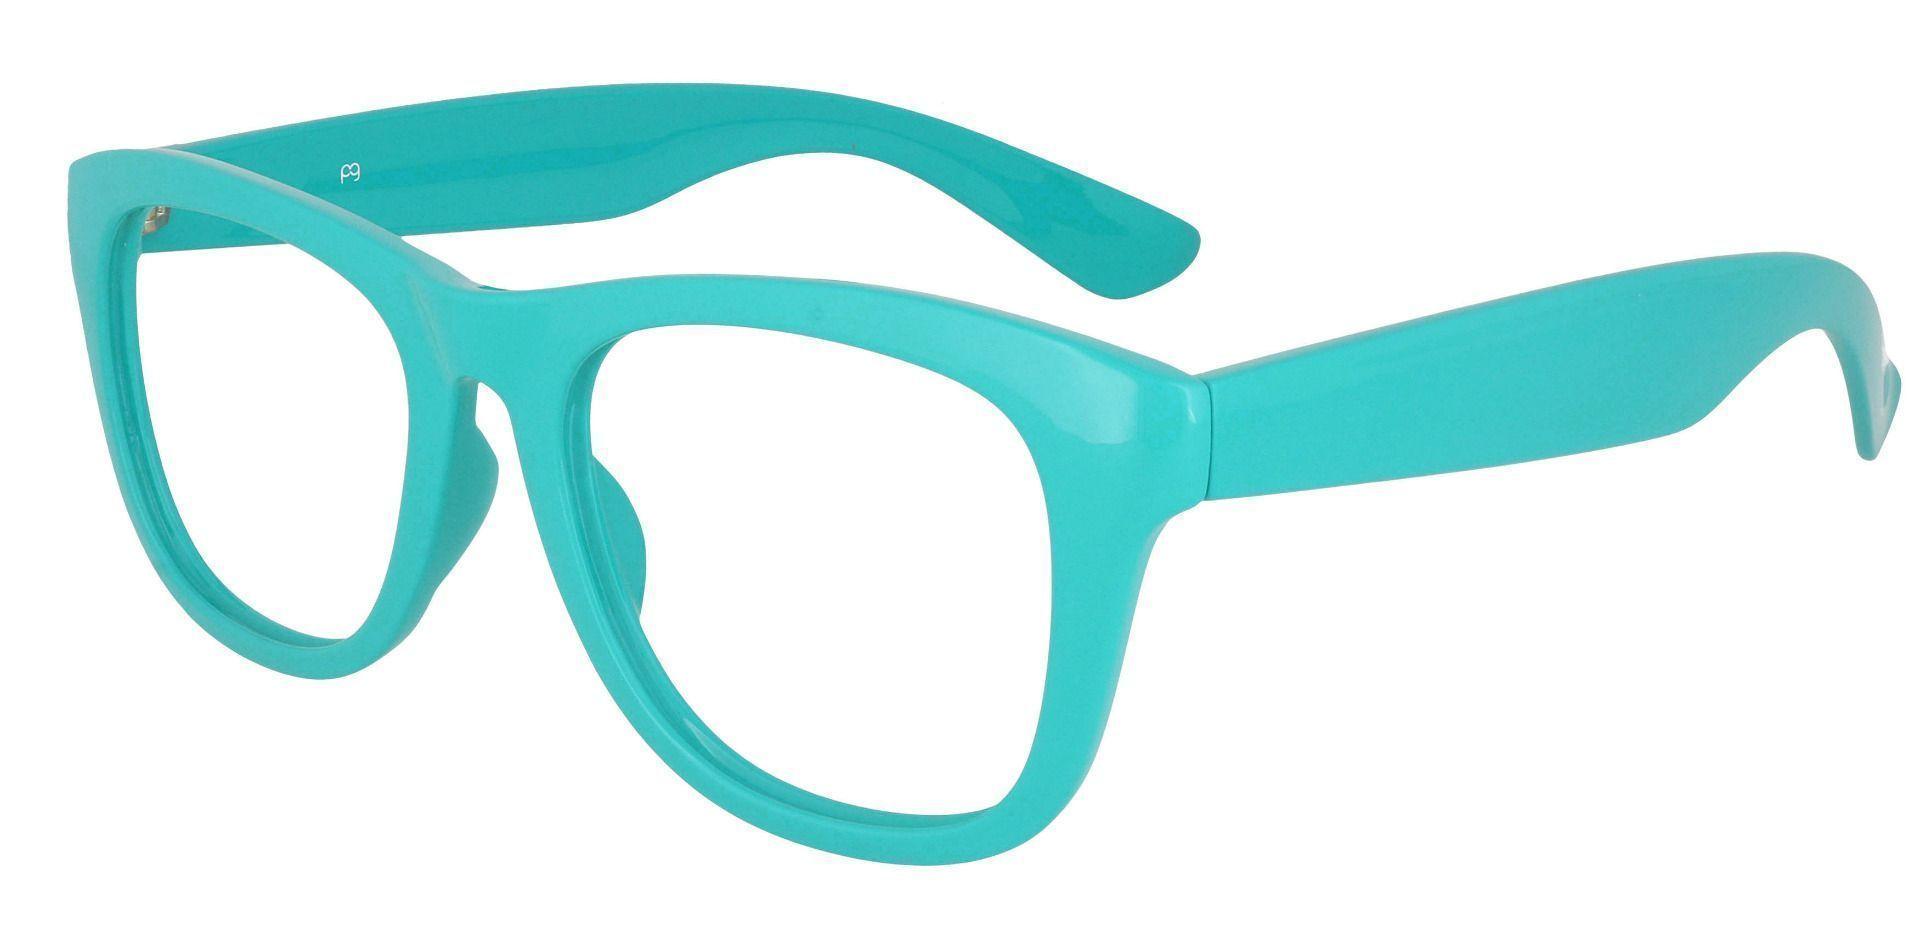 Callie Square Reading Glasses - Blue